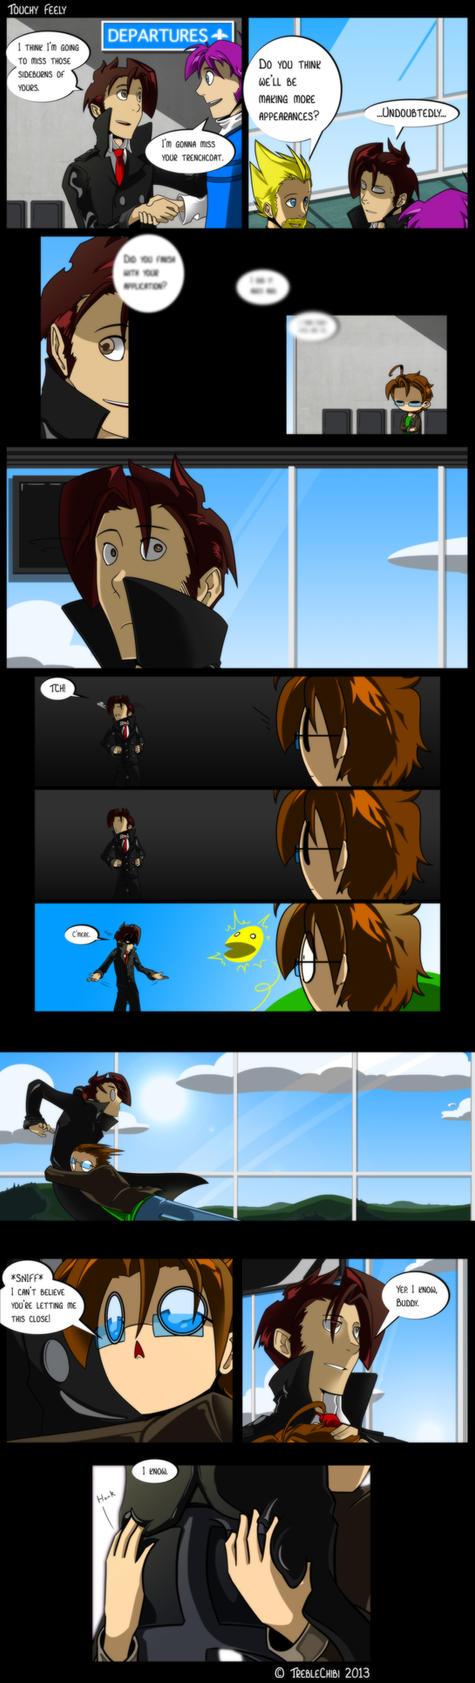 Comic Book Book: Beginning of the End by DukeStewart